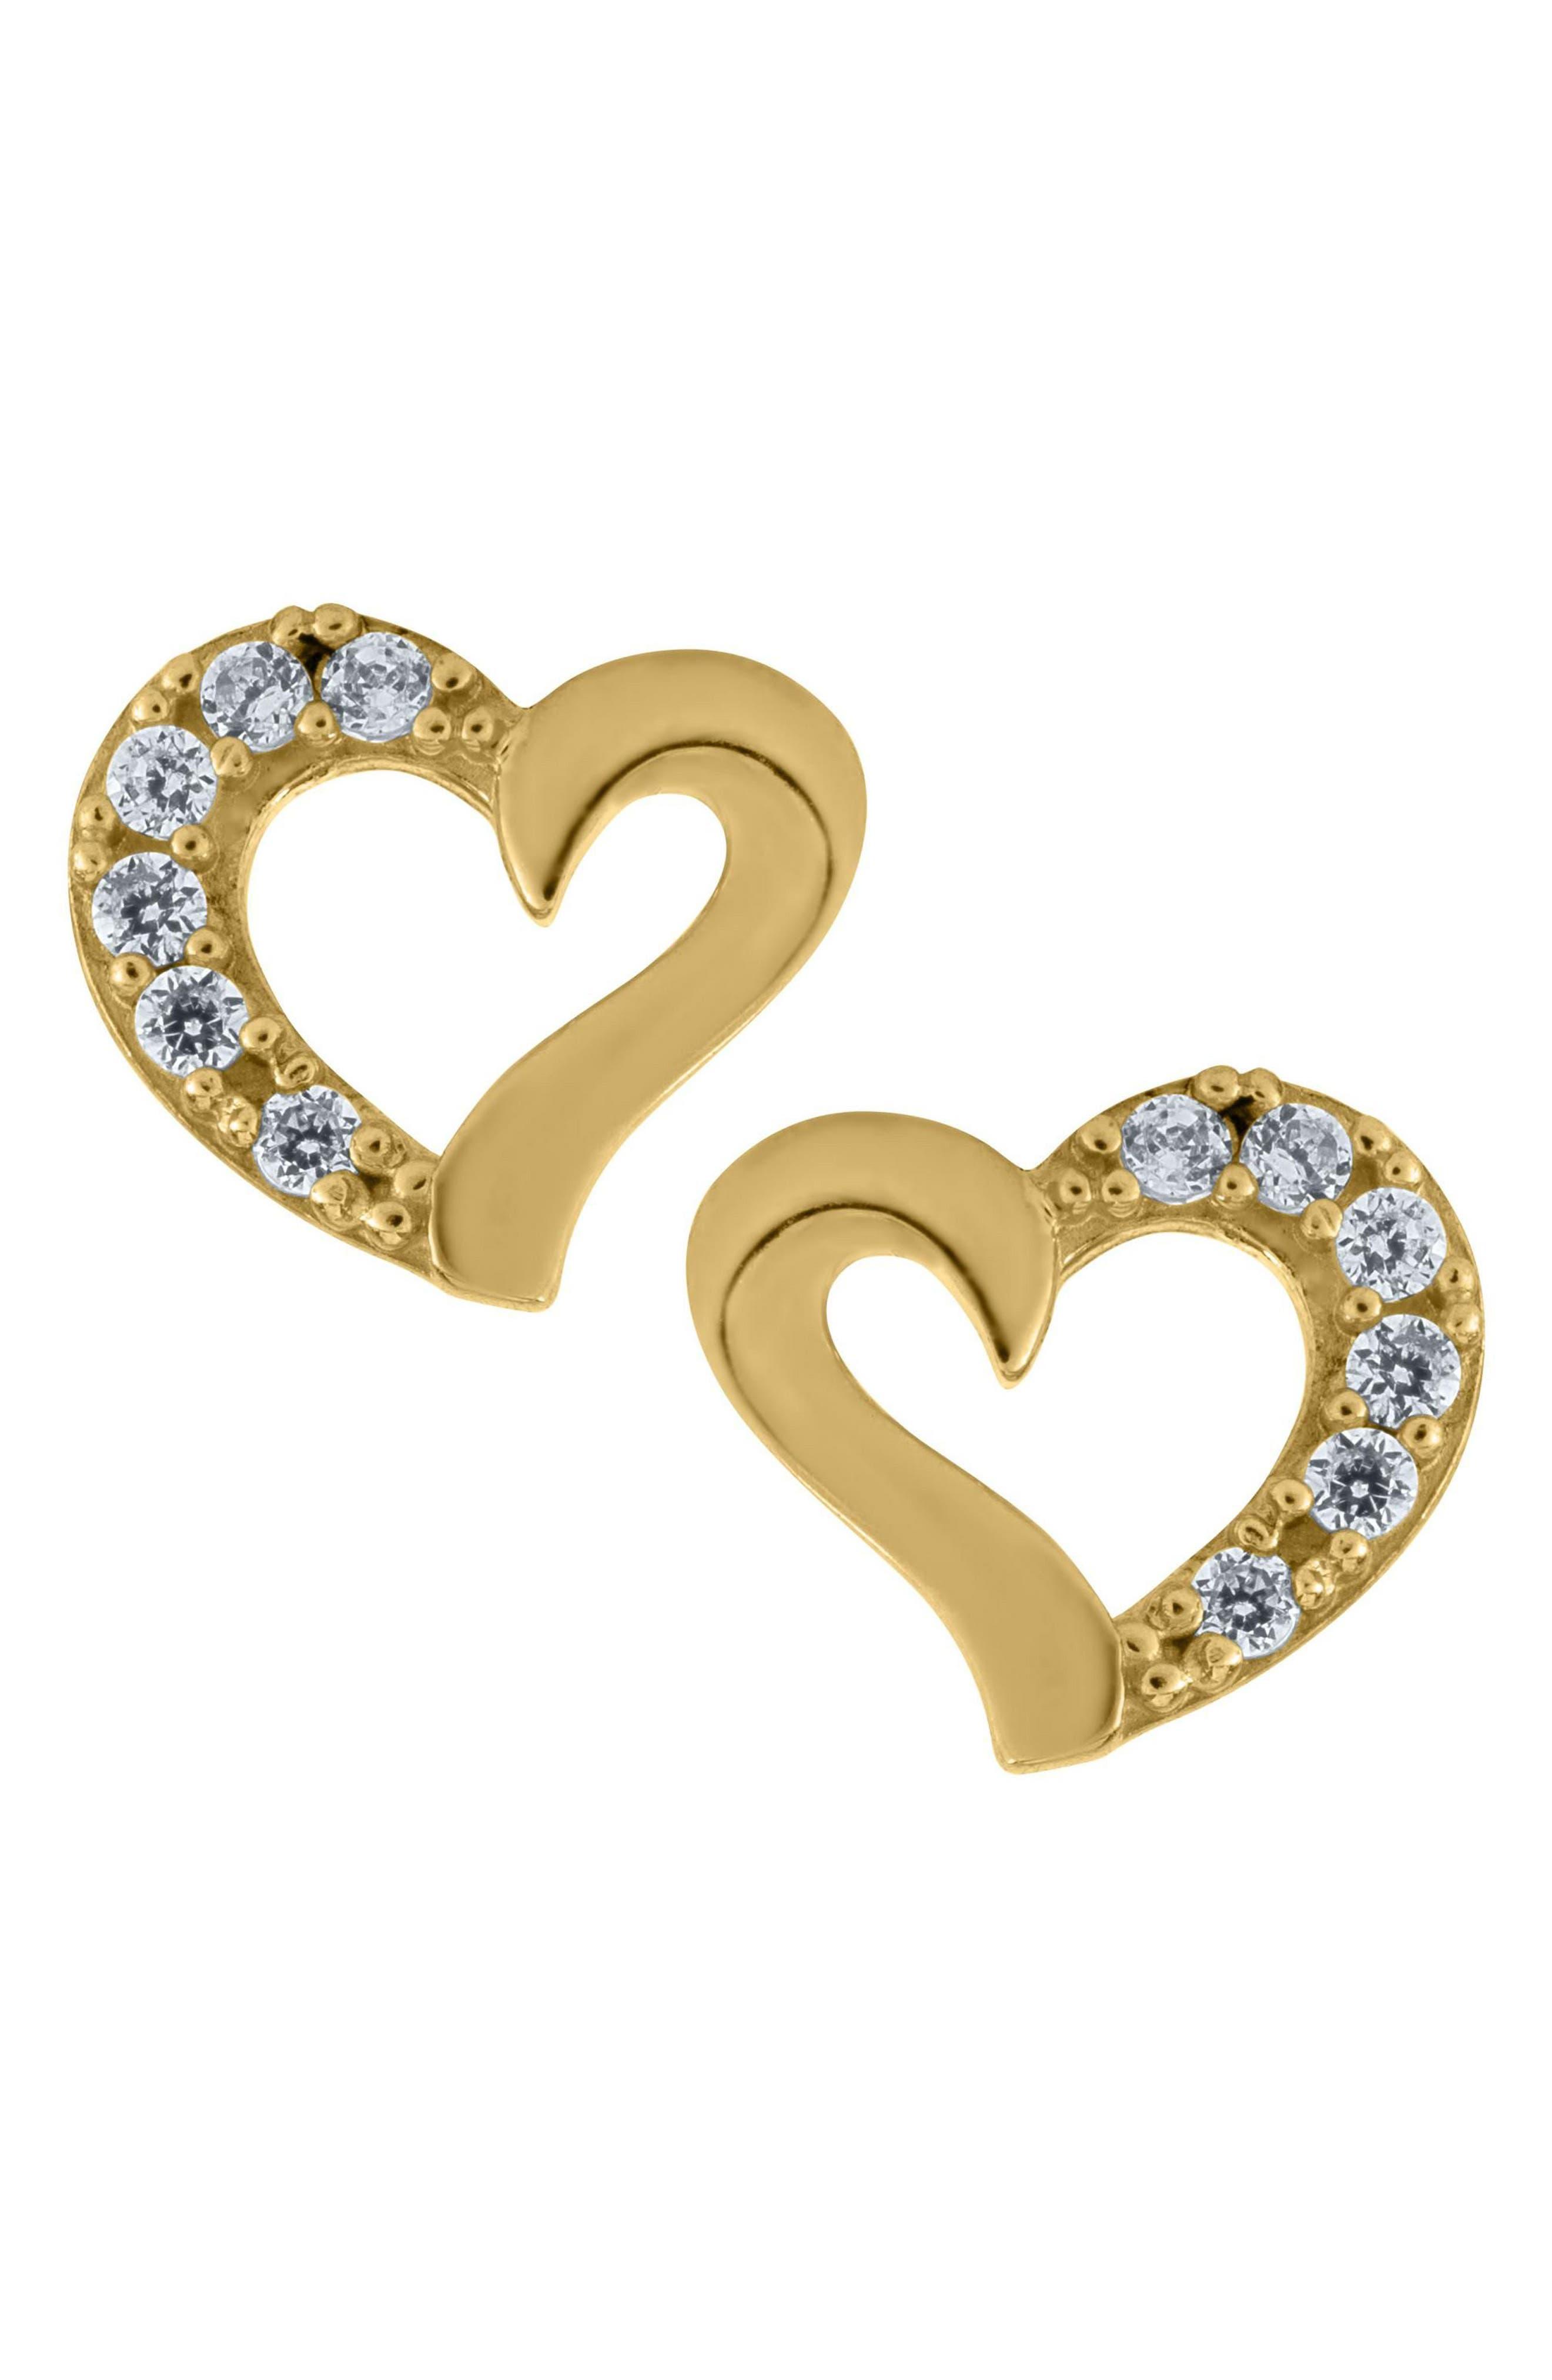 14k Gold Heart Earrings,                             Main thumbnail 1, color,                             GOLD